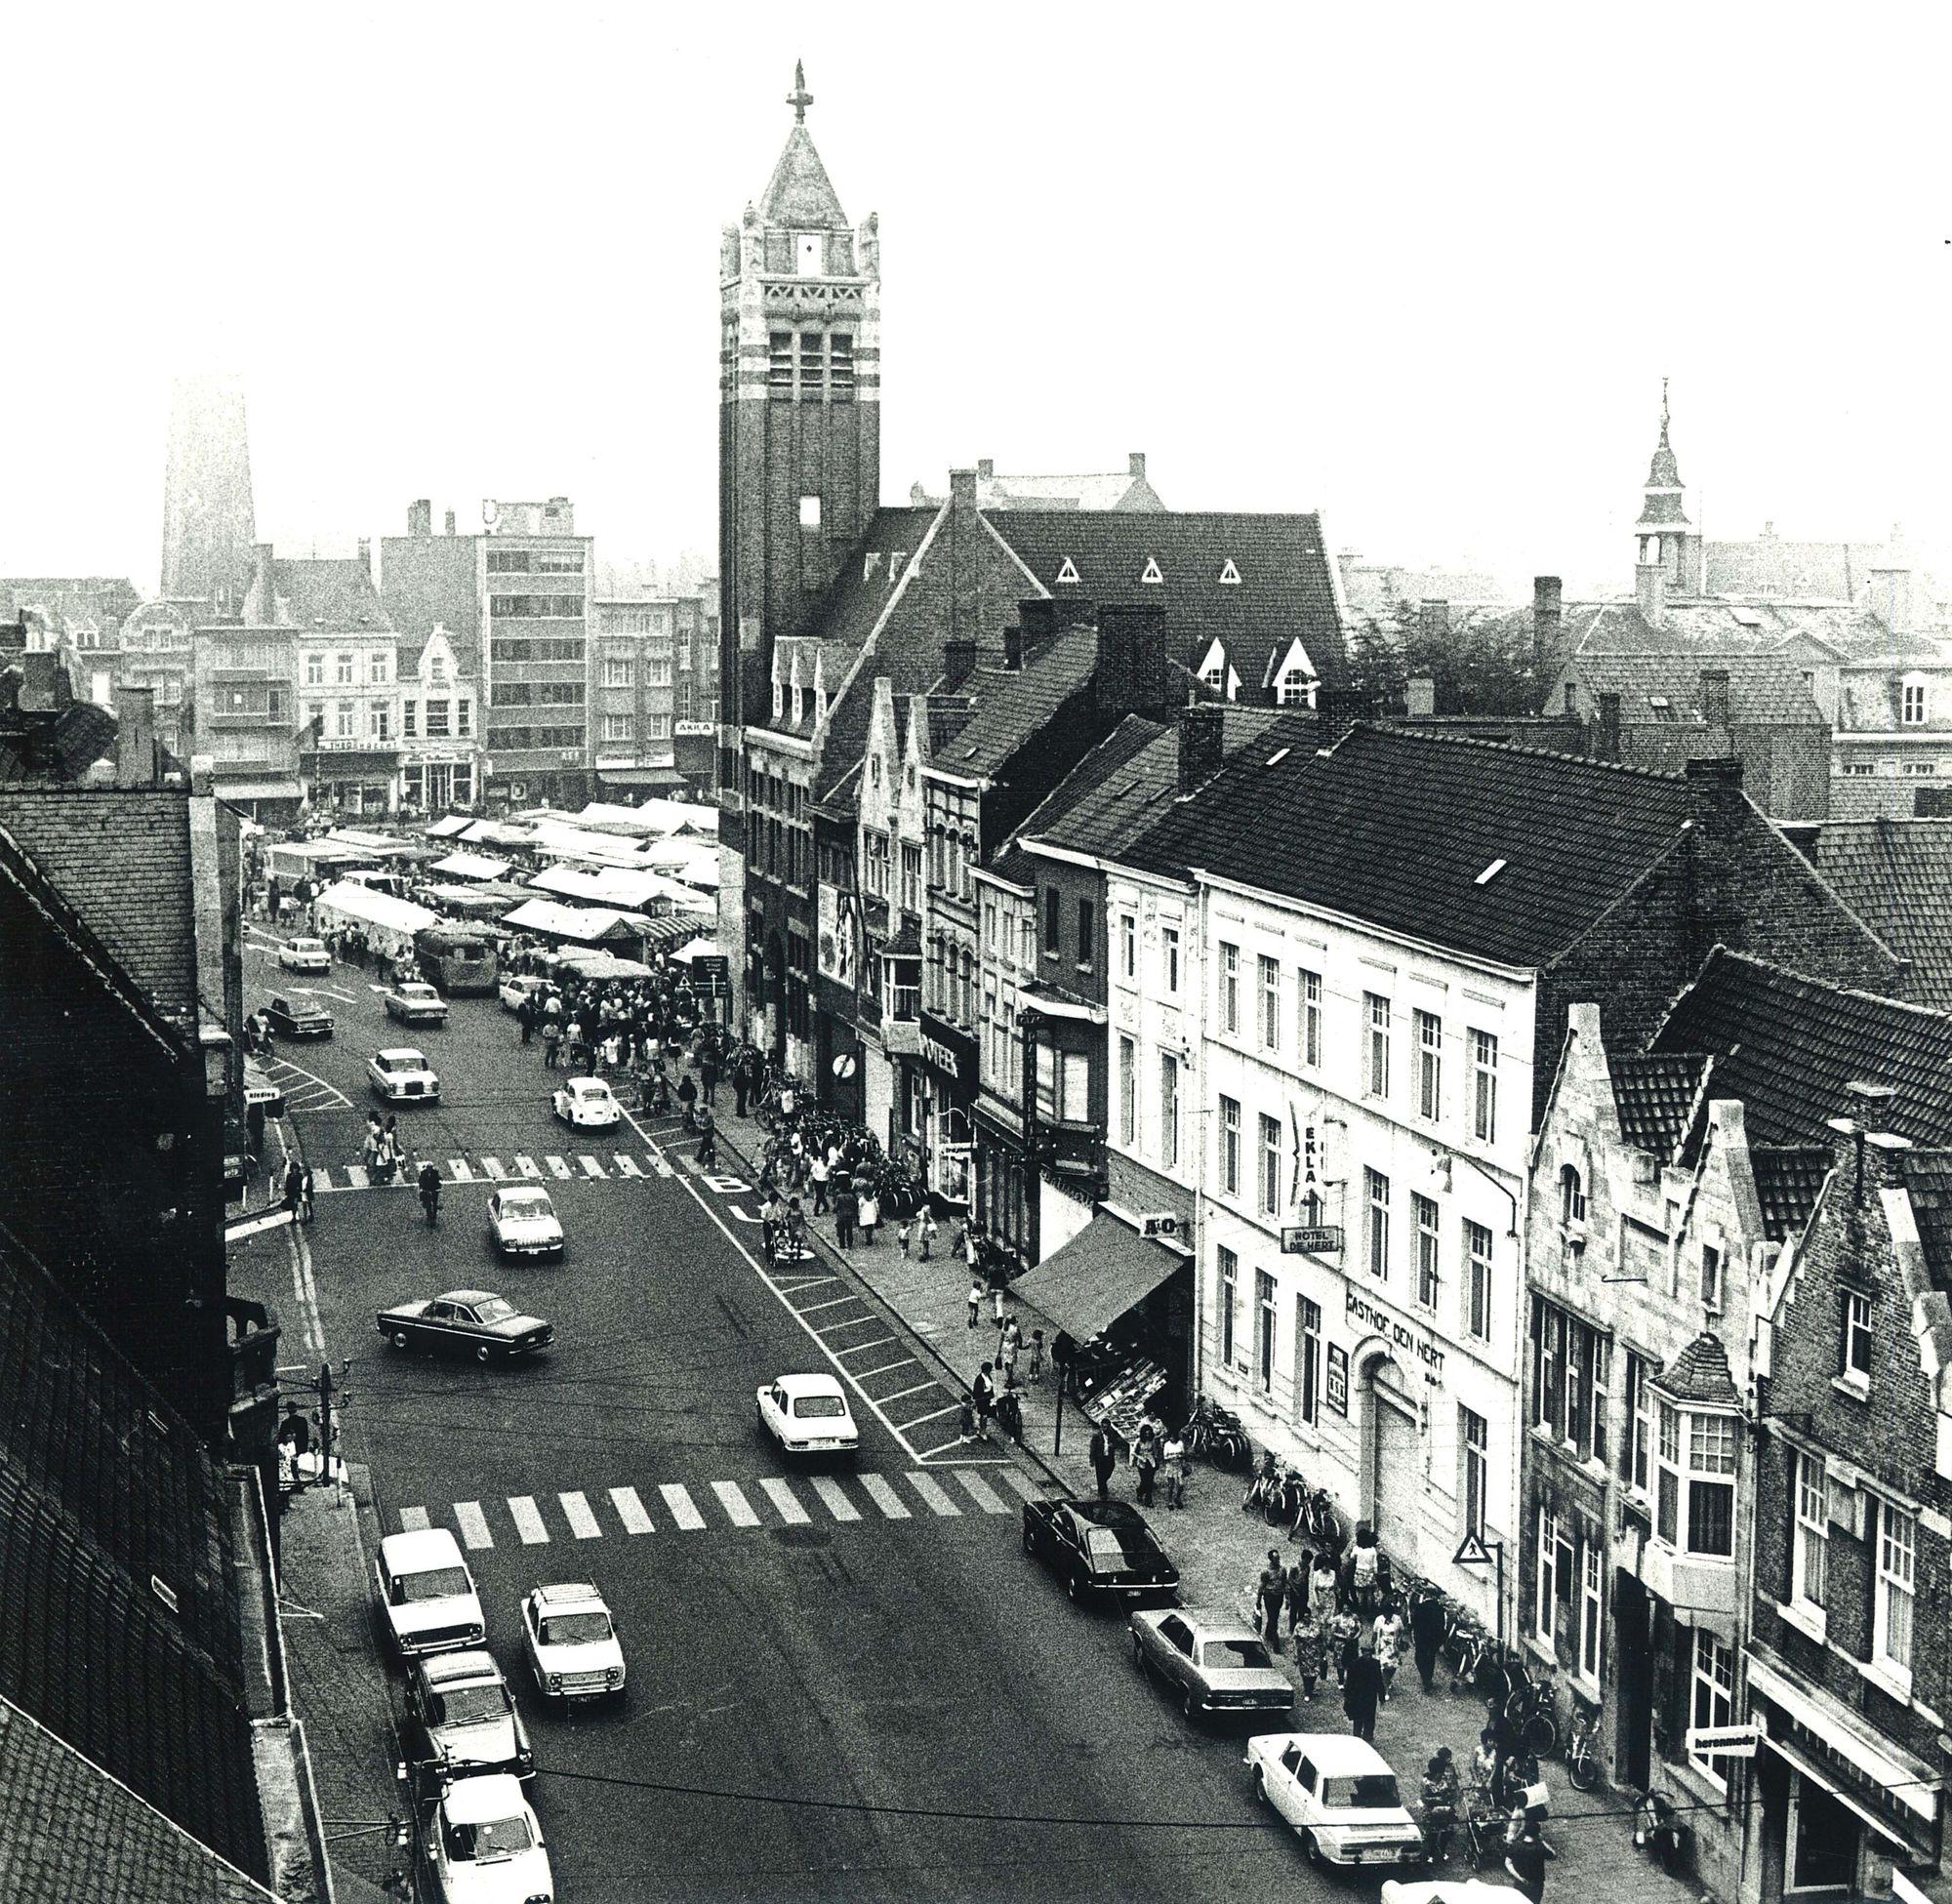 Jaarmarkt van Roeselare 1972